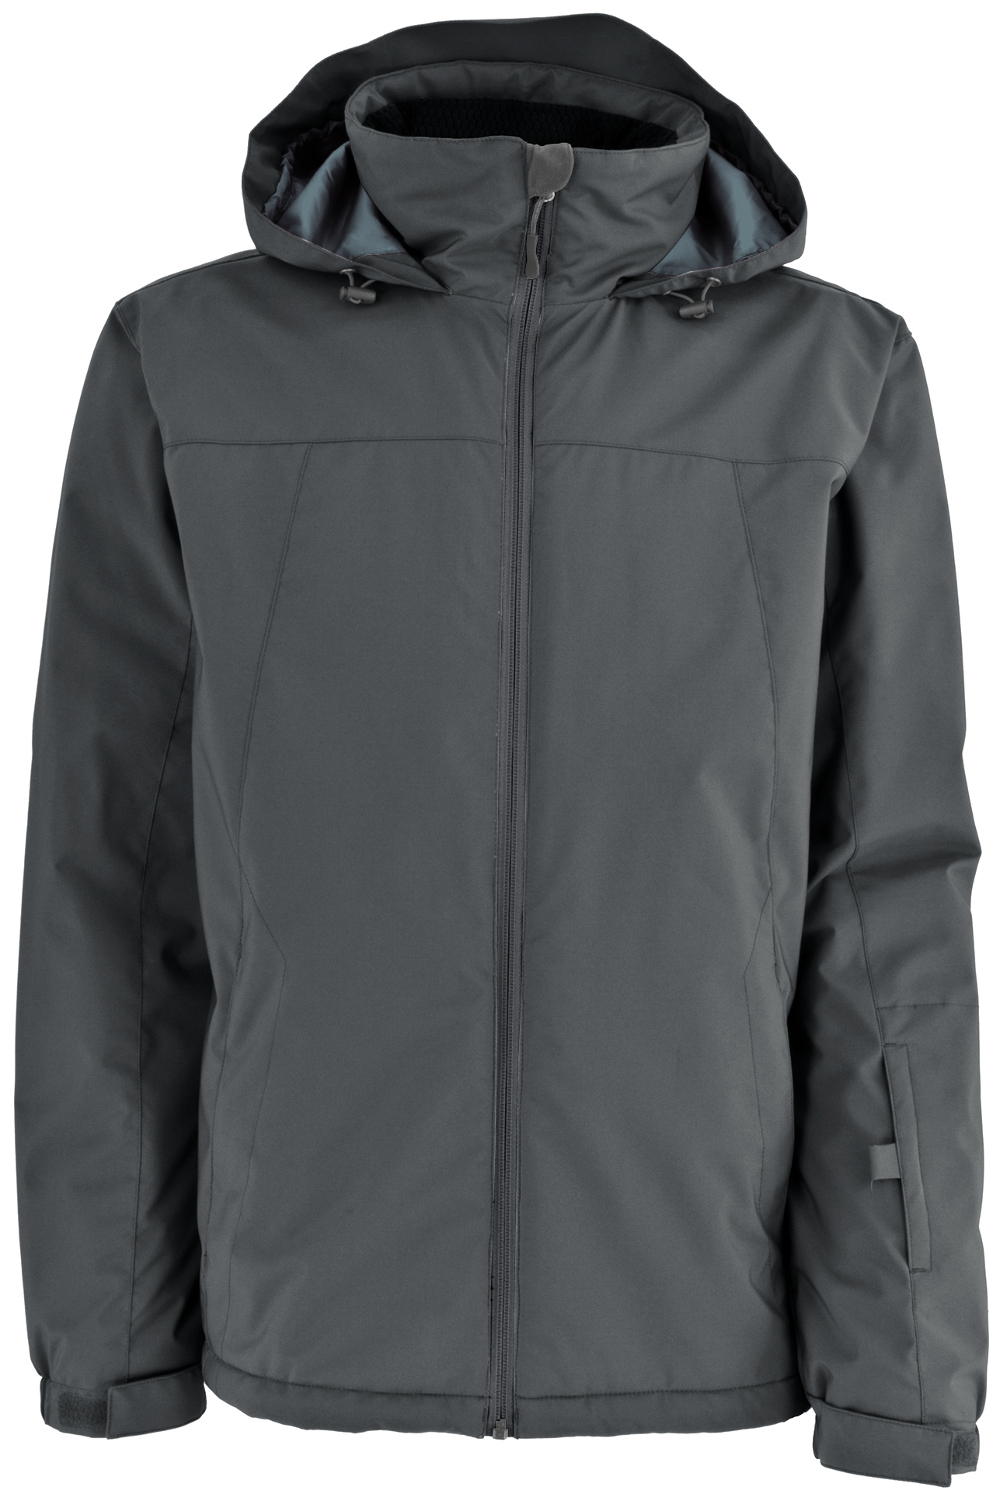 White Sierra Select Stretch Jacket